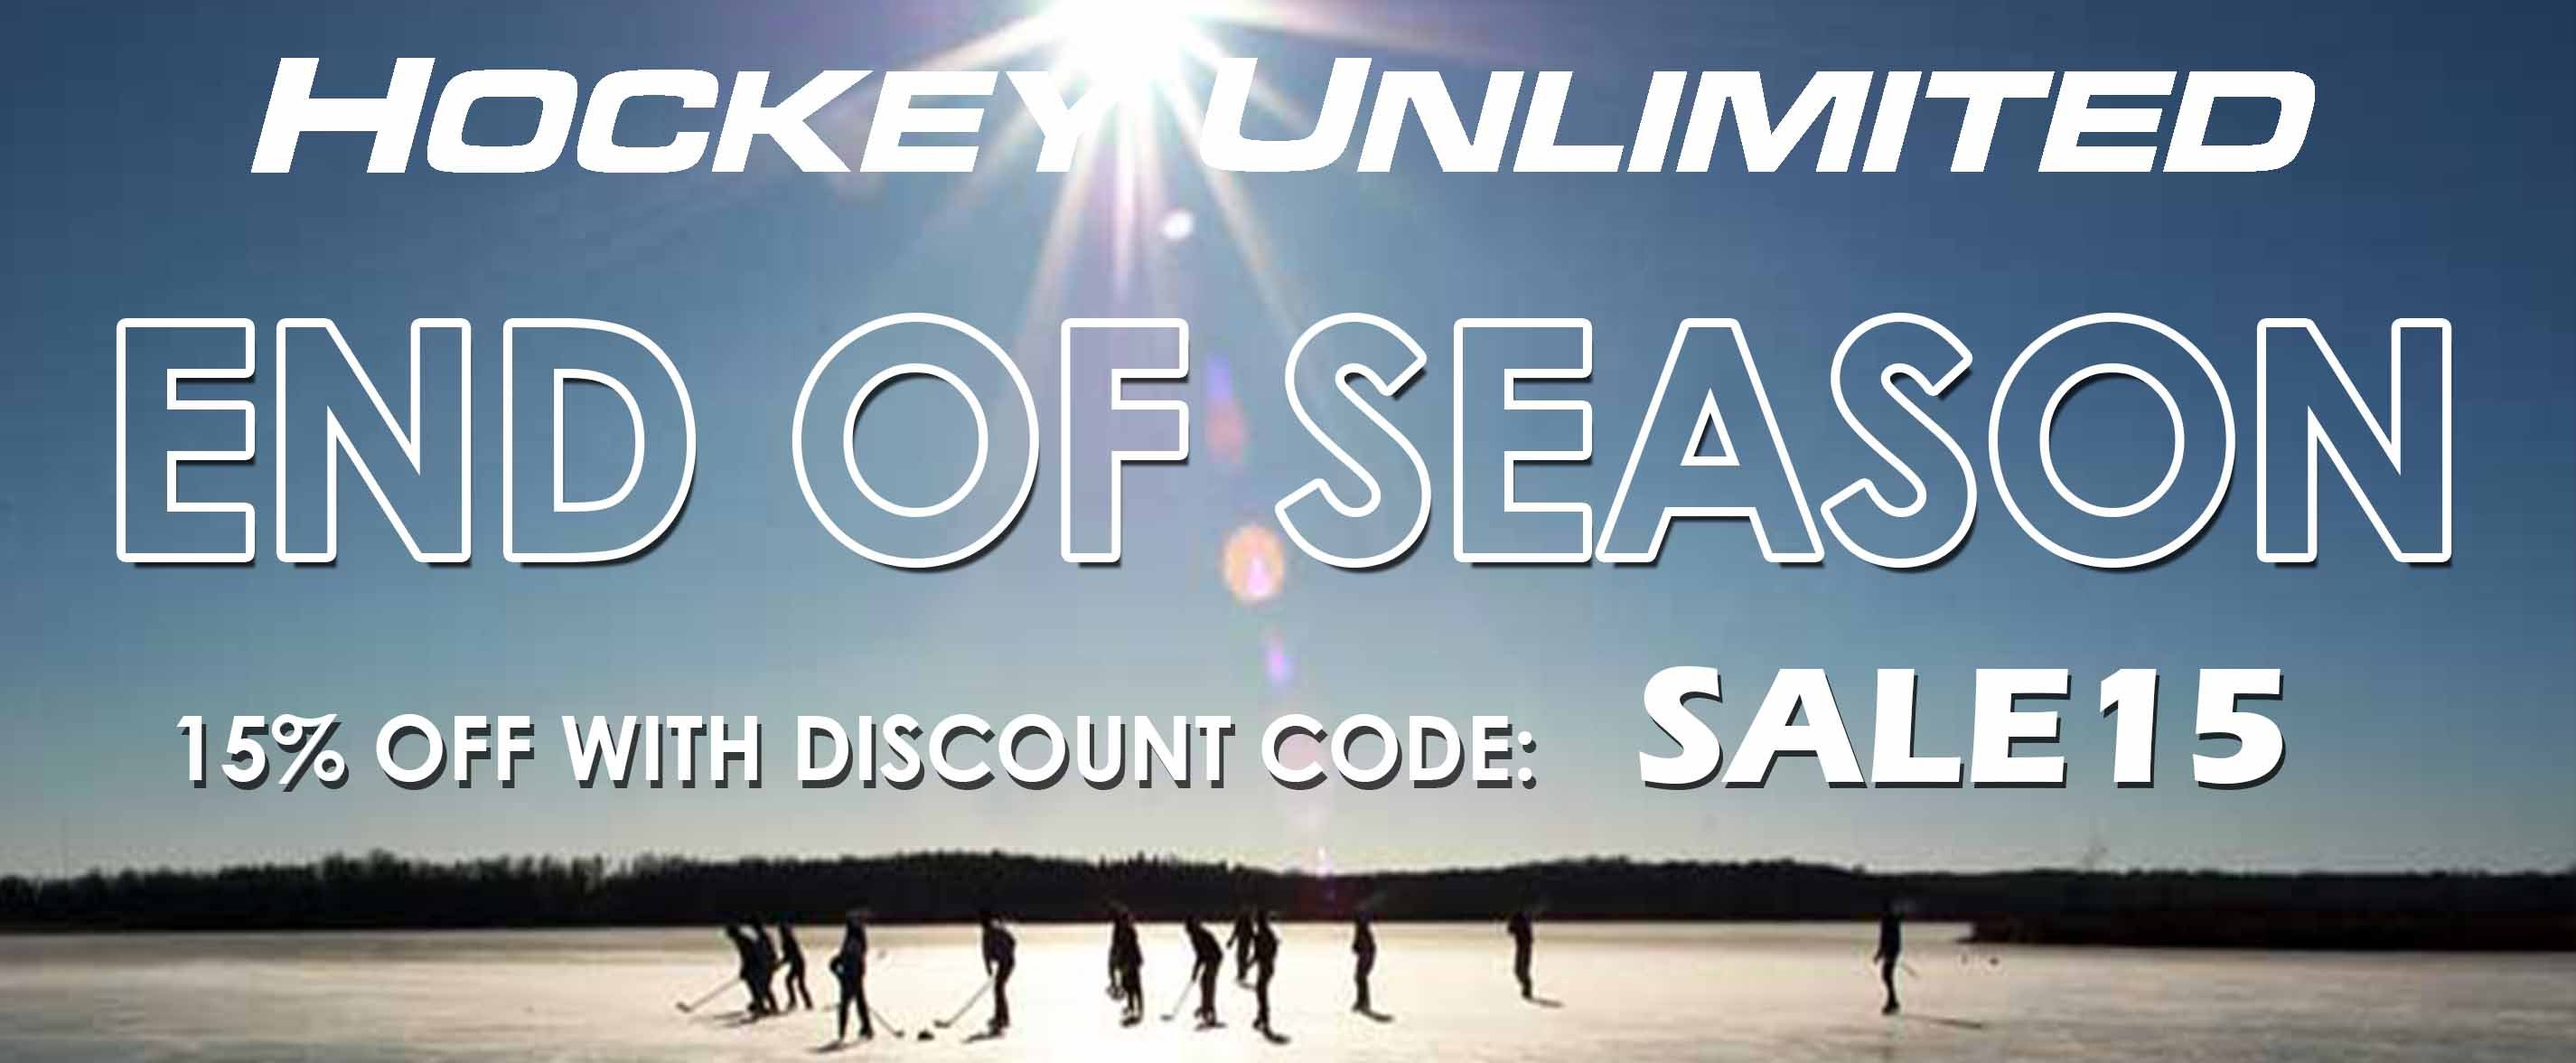 933a376d2bf Hockey Unlimited - Хоккейный магазин